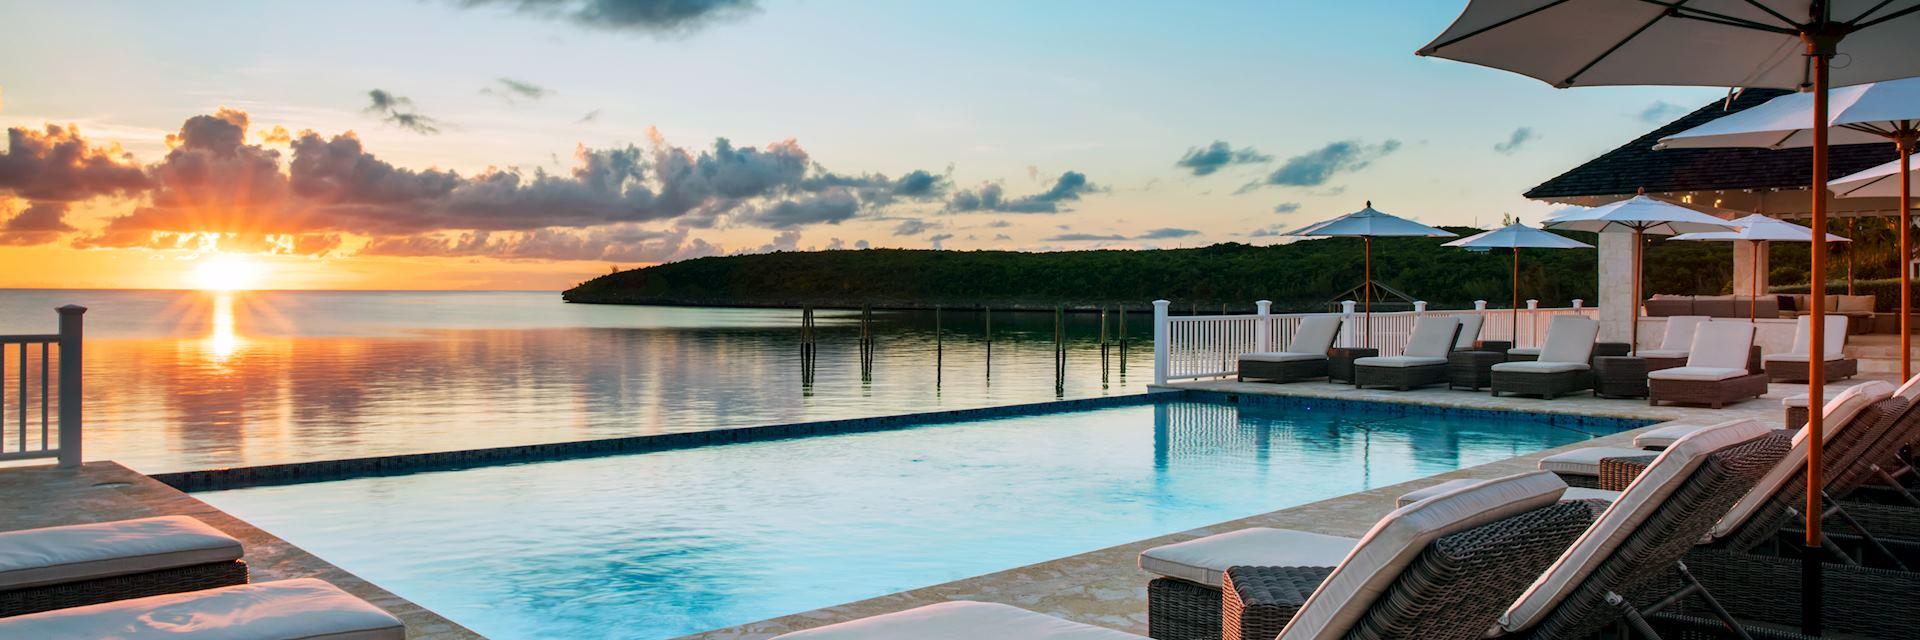 French Leave Resort, Bahamas